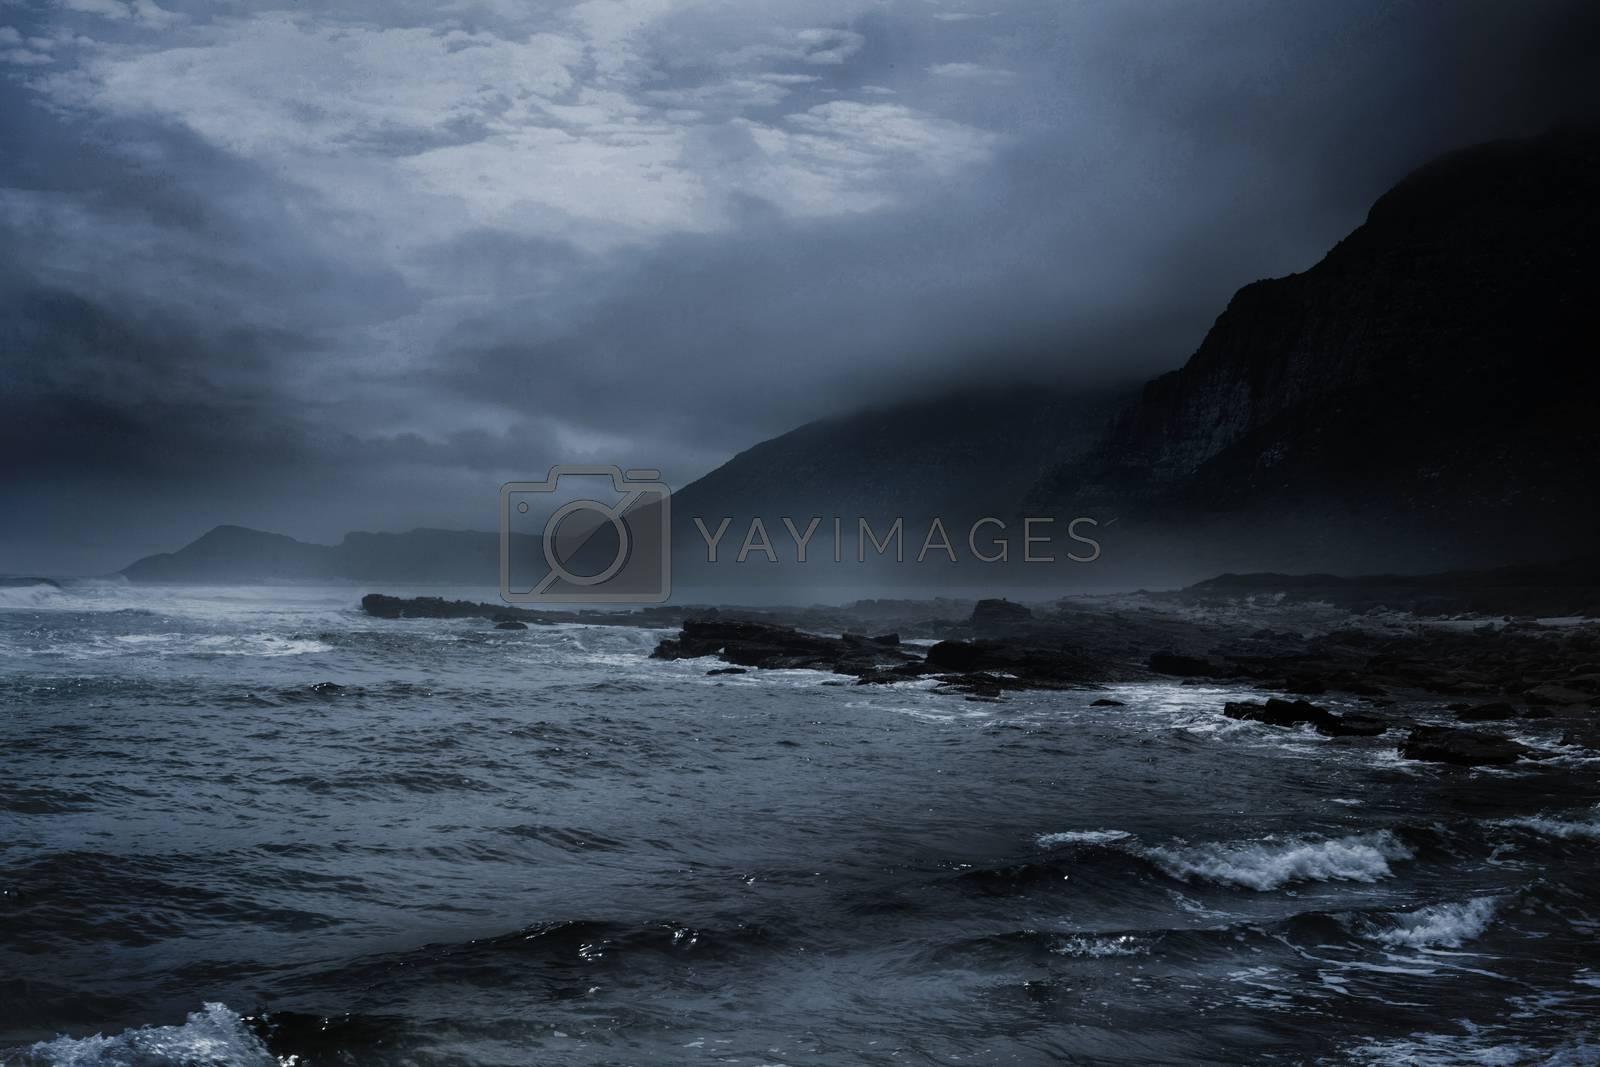 Stormy weather on the sea by Wavebreakmedia